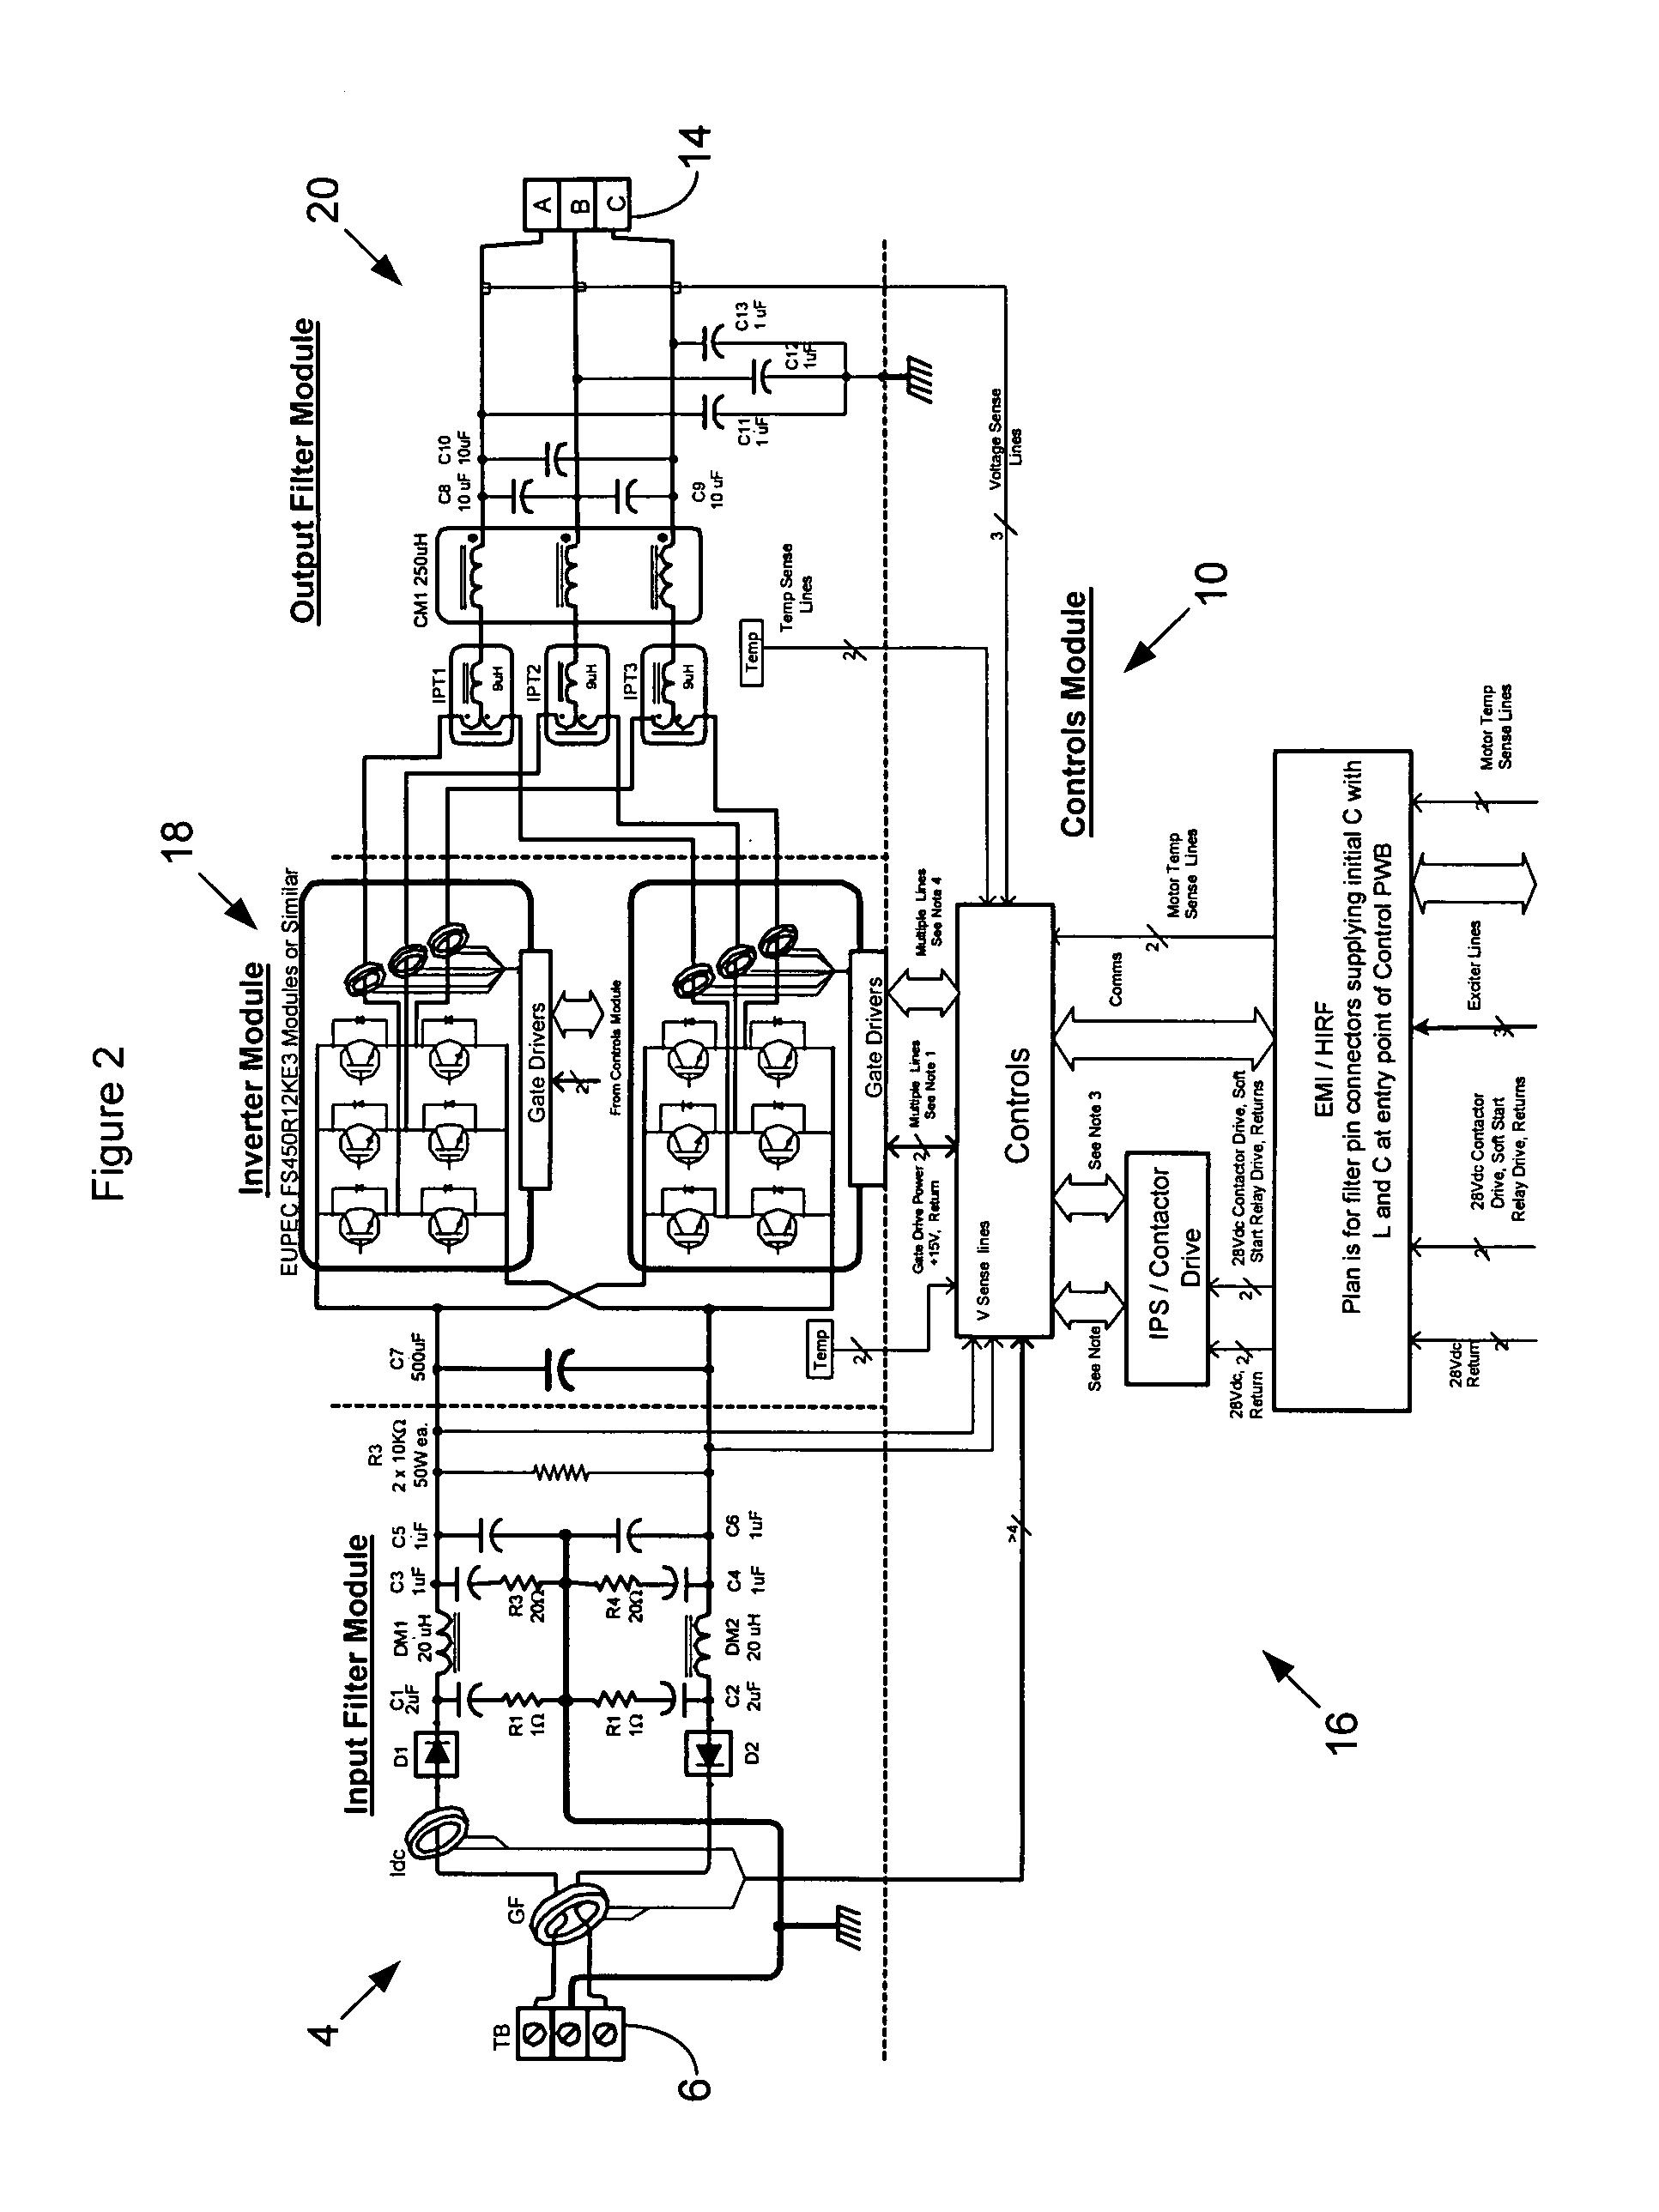 Honda Ridgeline Manual Transmission